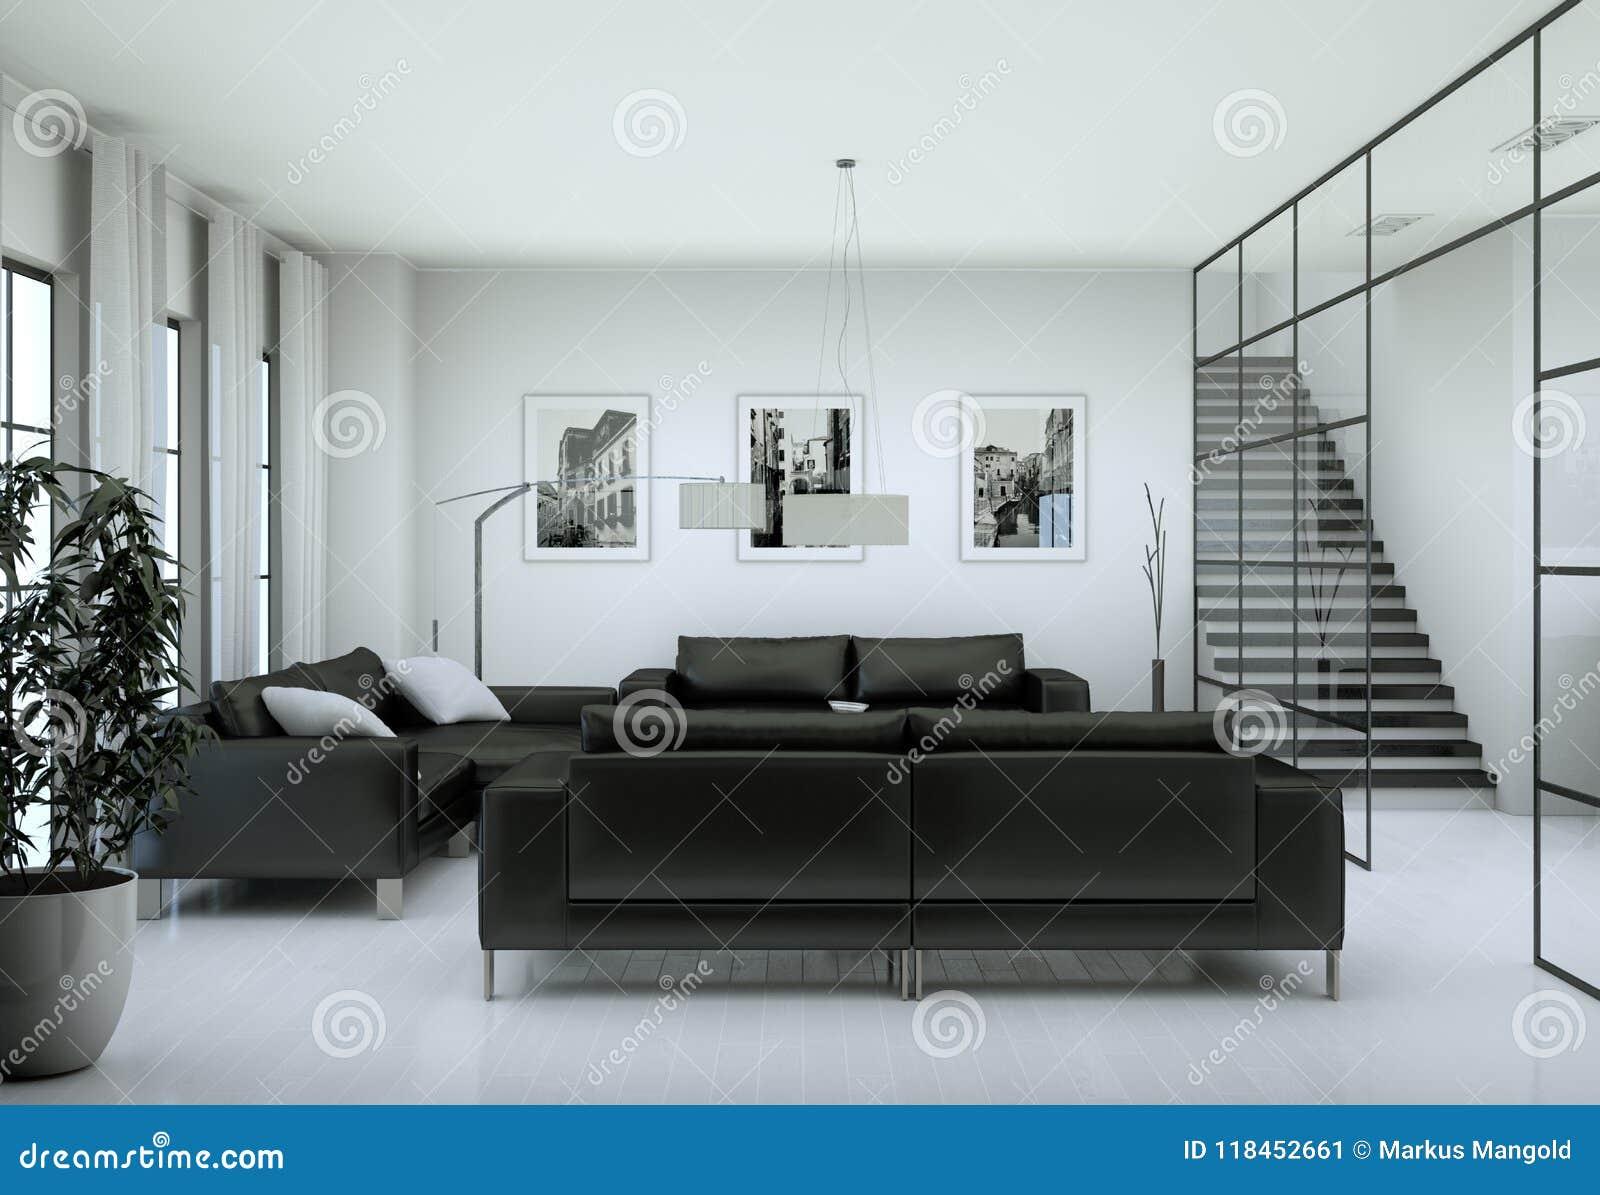 Modern Minimalist Living Room Interior In Loft Design Style With Sofas Stock Image Image Of Designer Environment 118452661